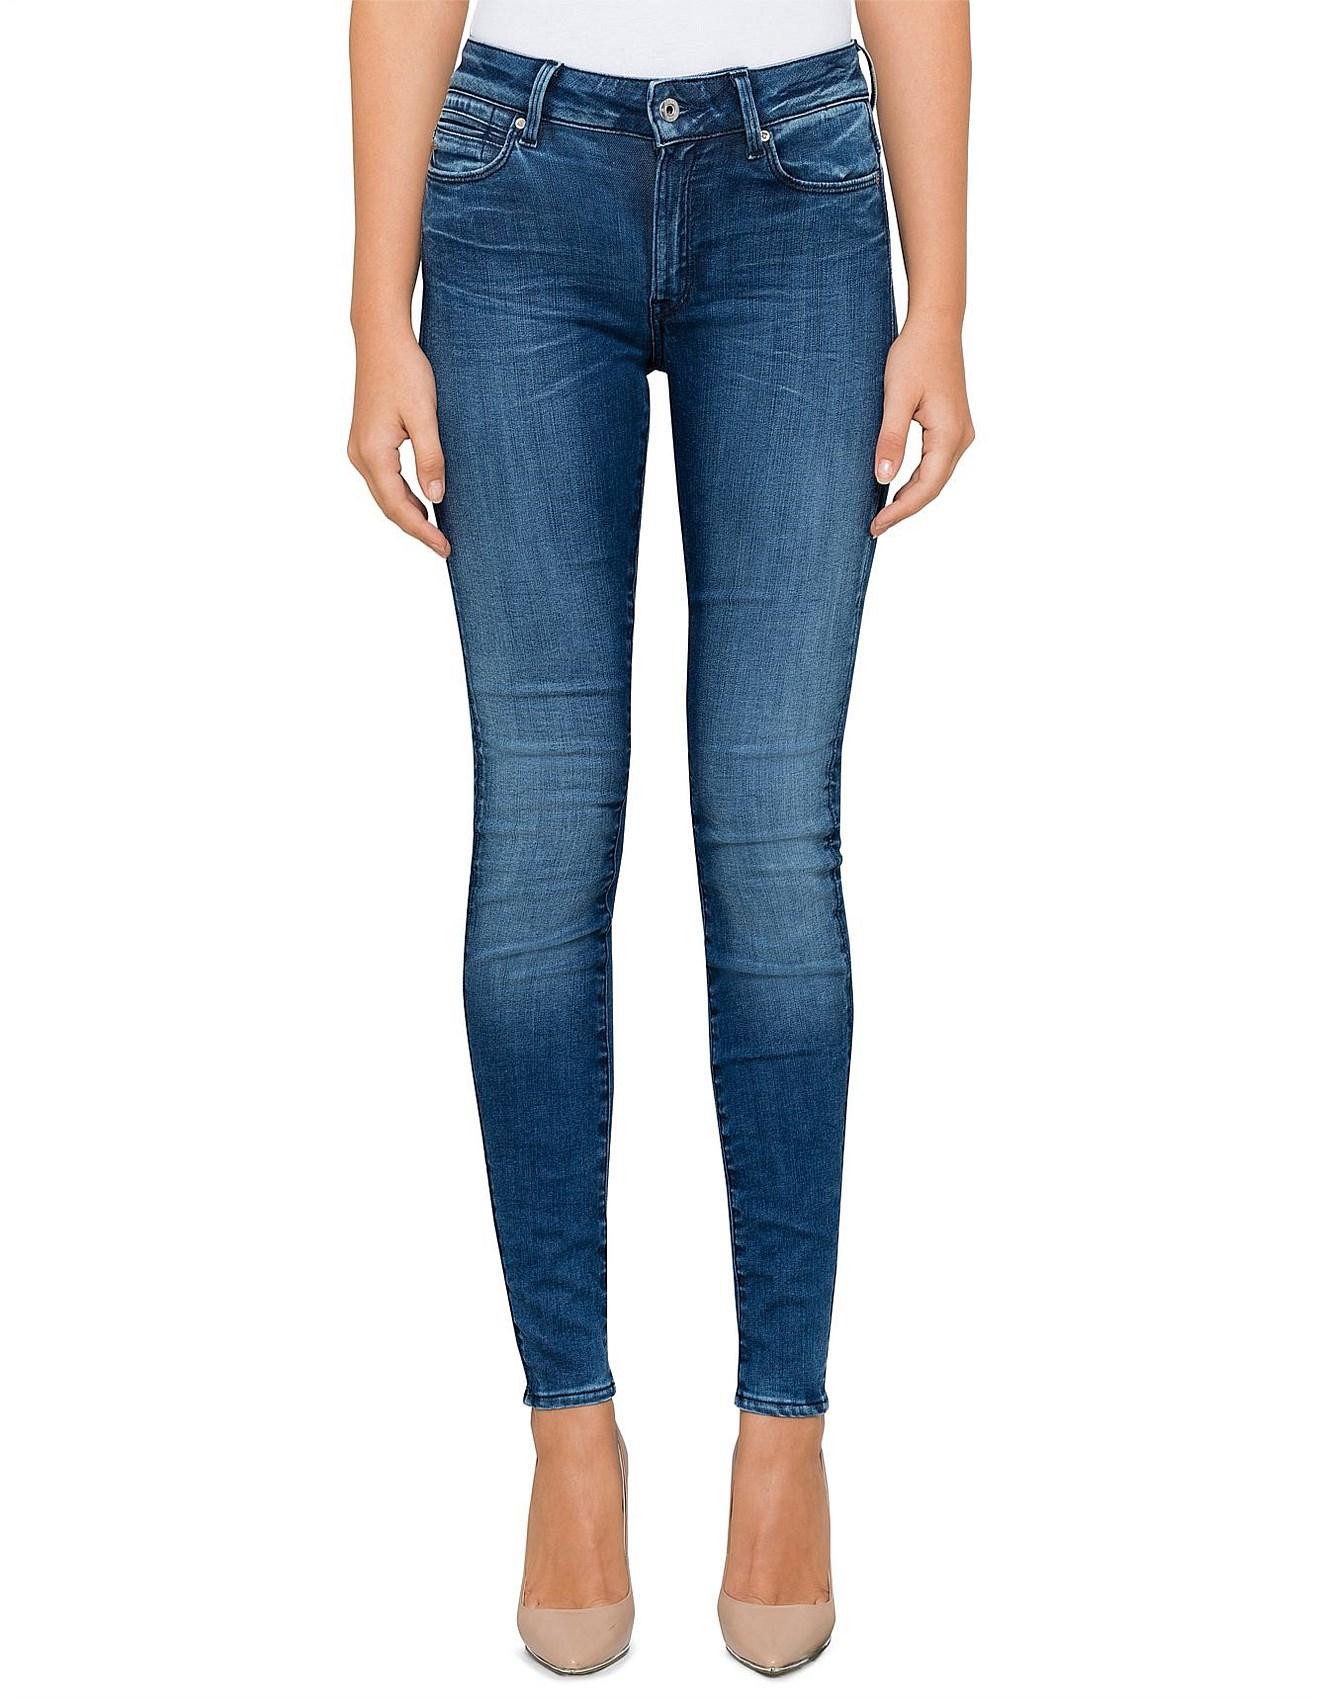 women 39 s jeans sale jeans sale denim sale david jones. Black Bedroom Furniture Sets. Home Design Ideas